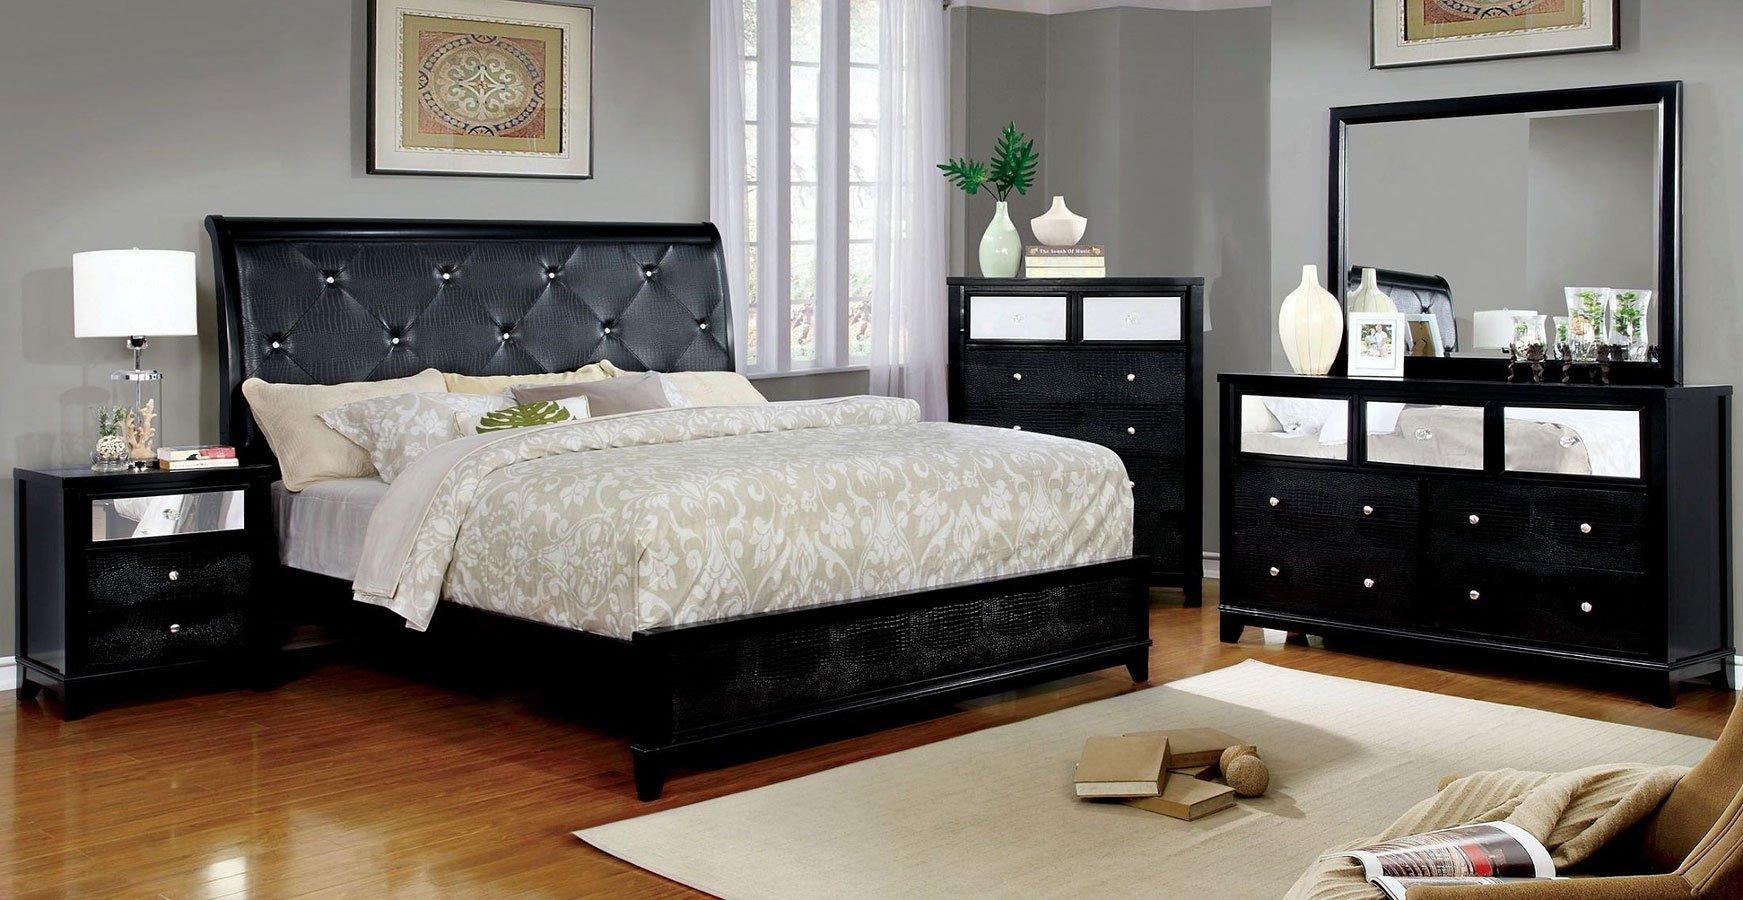 Bryant Ii Sleigh Bedroom Set Black Bedroom Sets Bedroom Furniture Bedroom